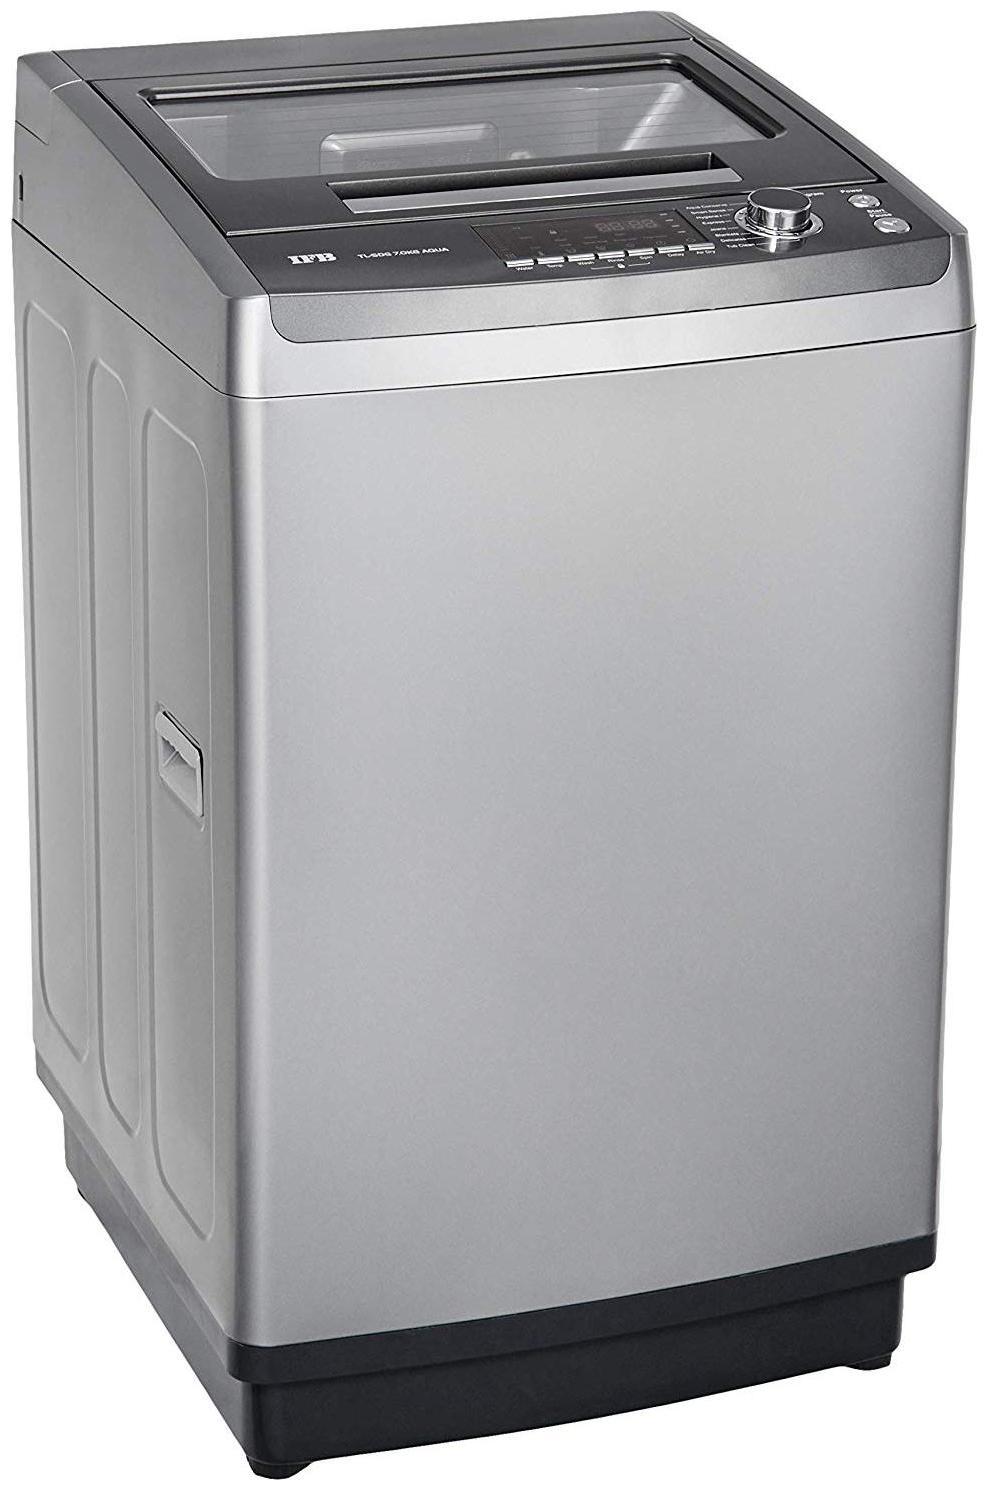 IFB 7 kg Fully Automatic Top Load Washing machine   TL 70SGDG , Grey by Bajaj Electronics